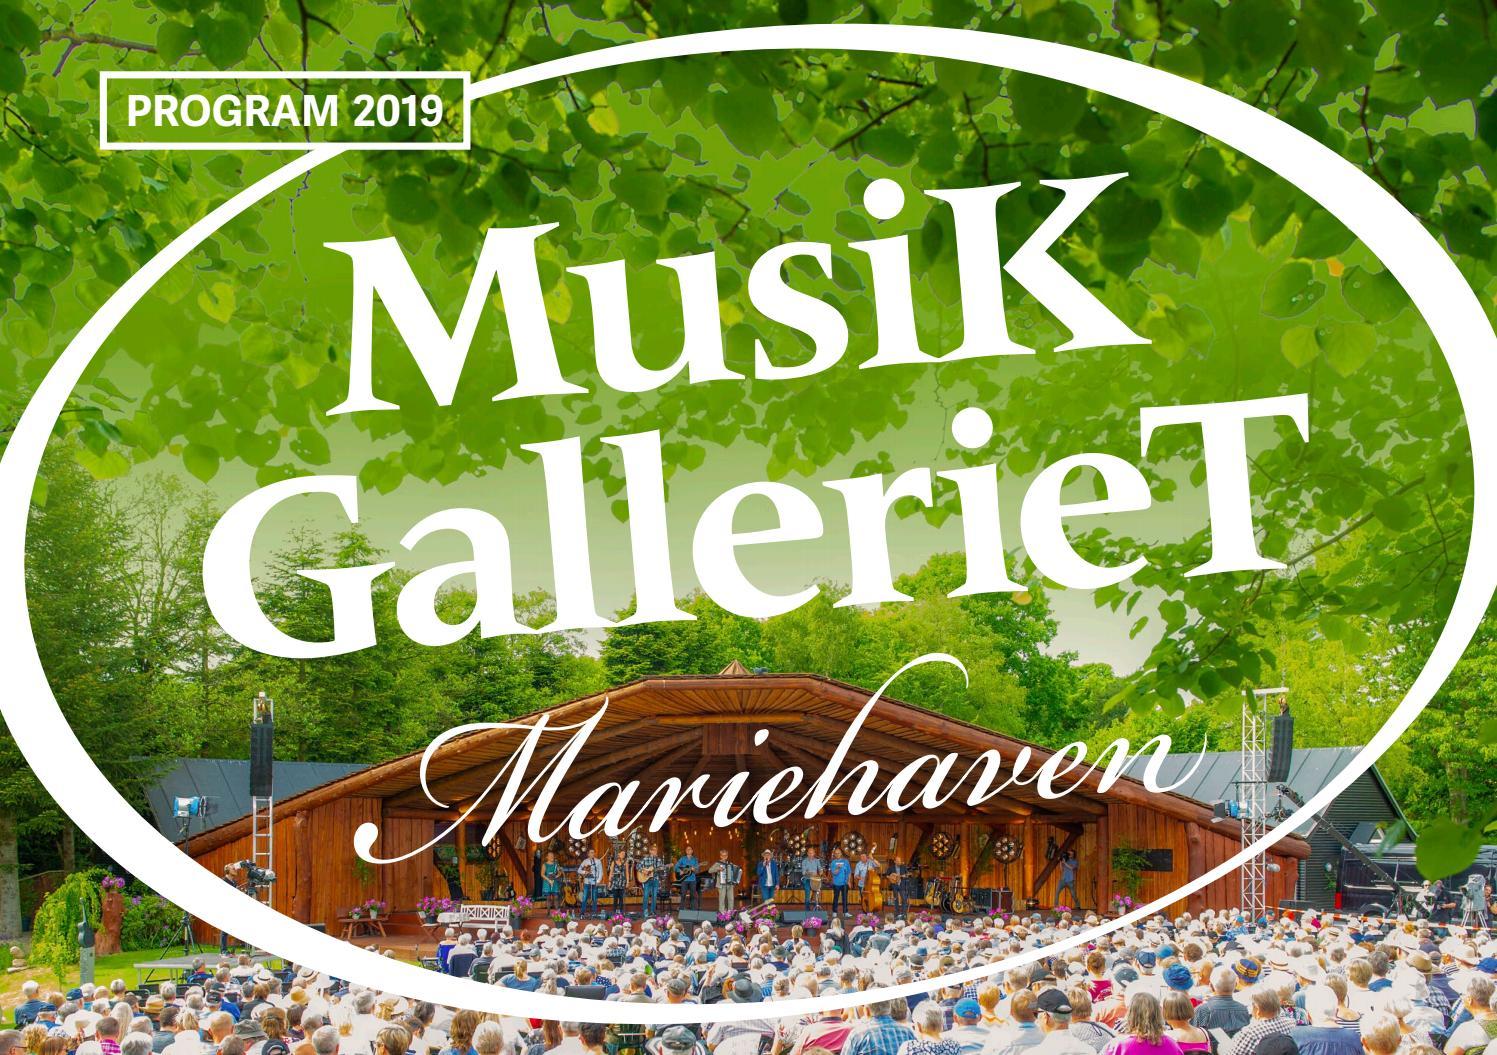 Mariehaven Program For 2019 By Karsten Madsen Issuu